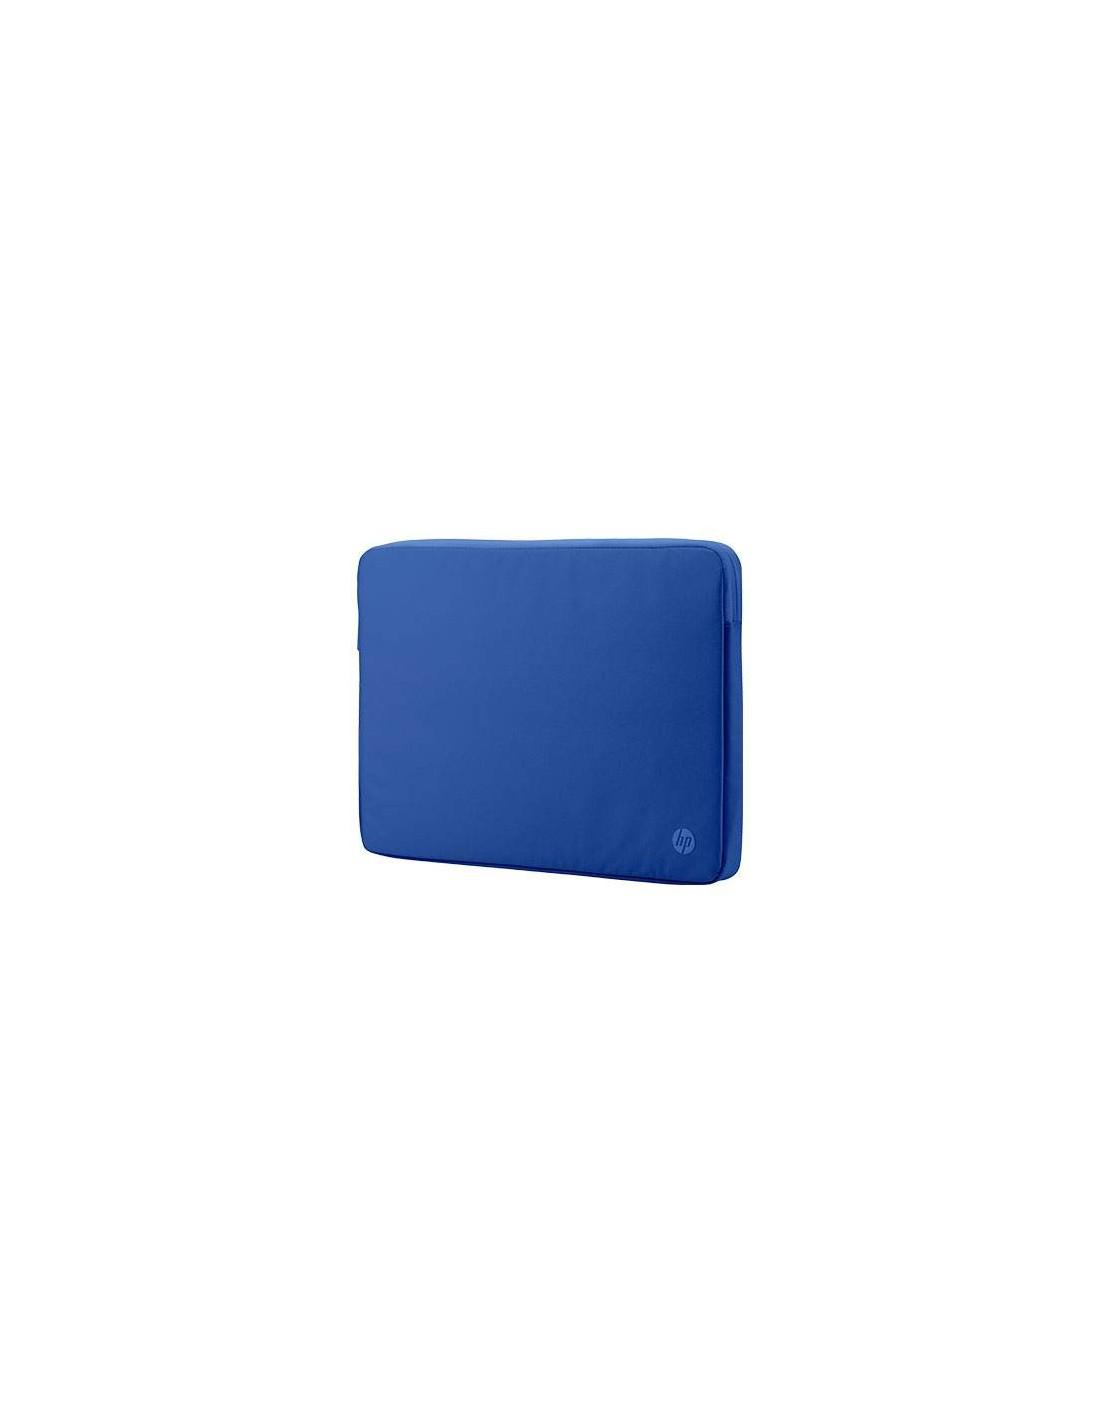 hp k8h28aa 15 6 housse bleu sacoche d 39 ordinateurs portables. Black Bedroom Furniture Sets. Home Design Ideas